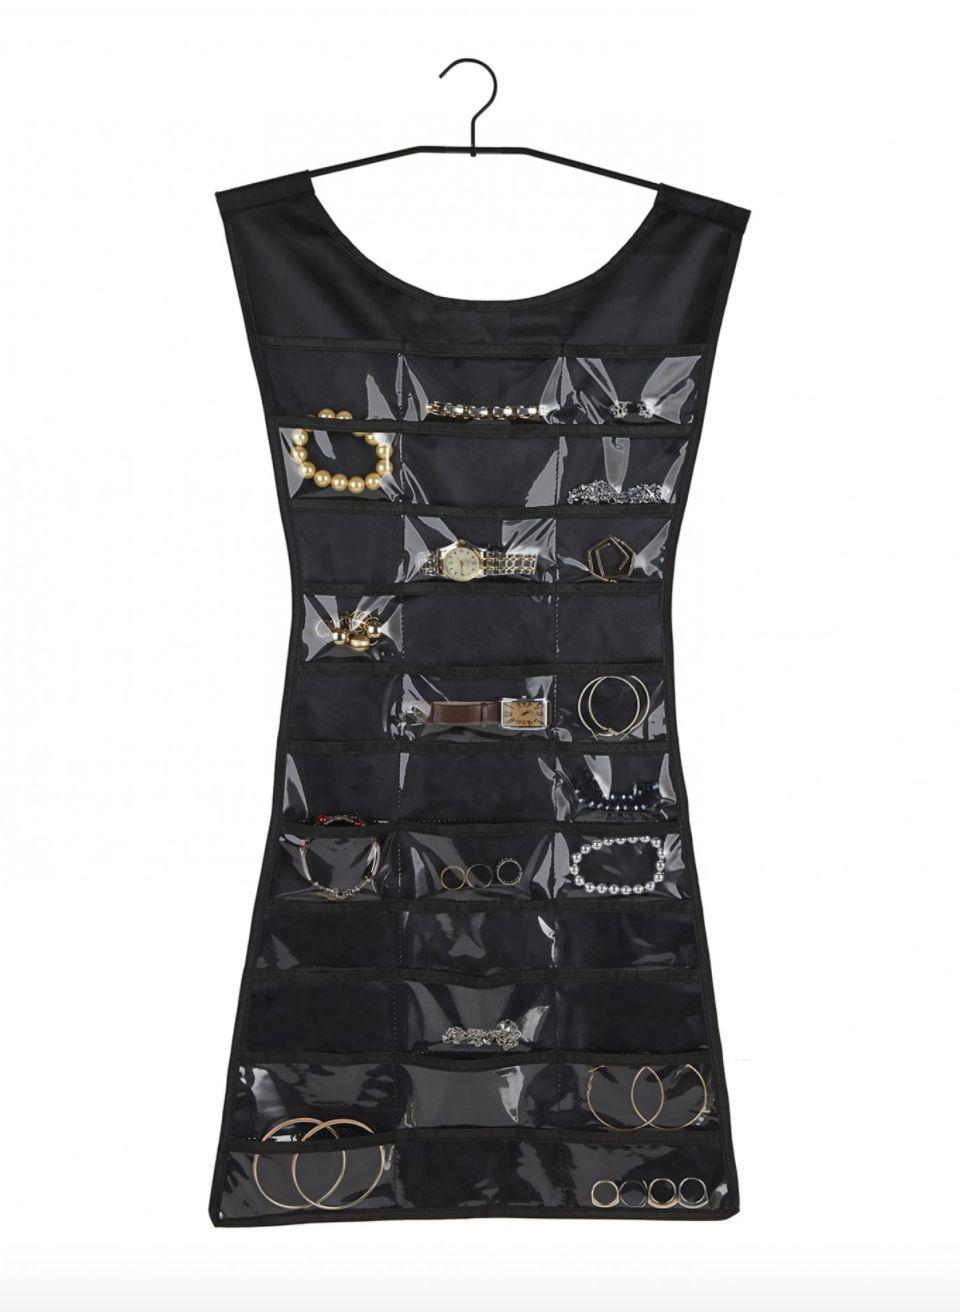 Little Black Dress Jewelry Organizer Products